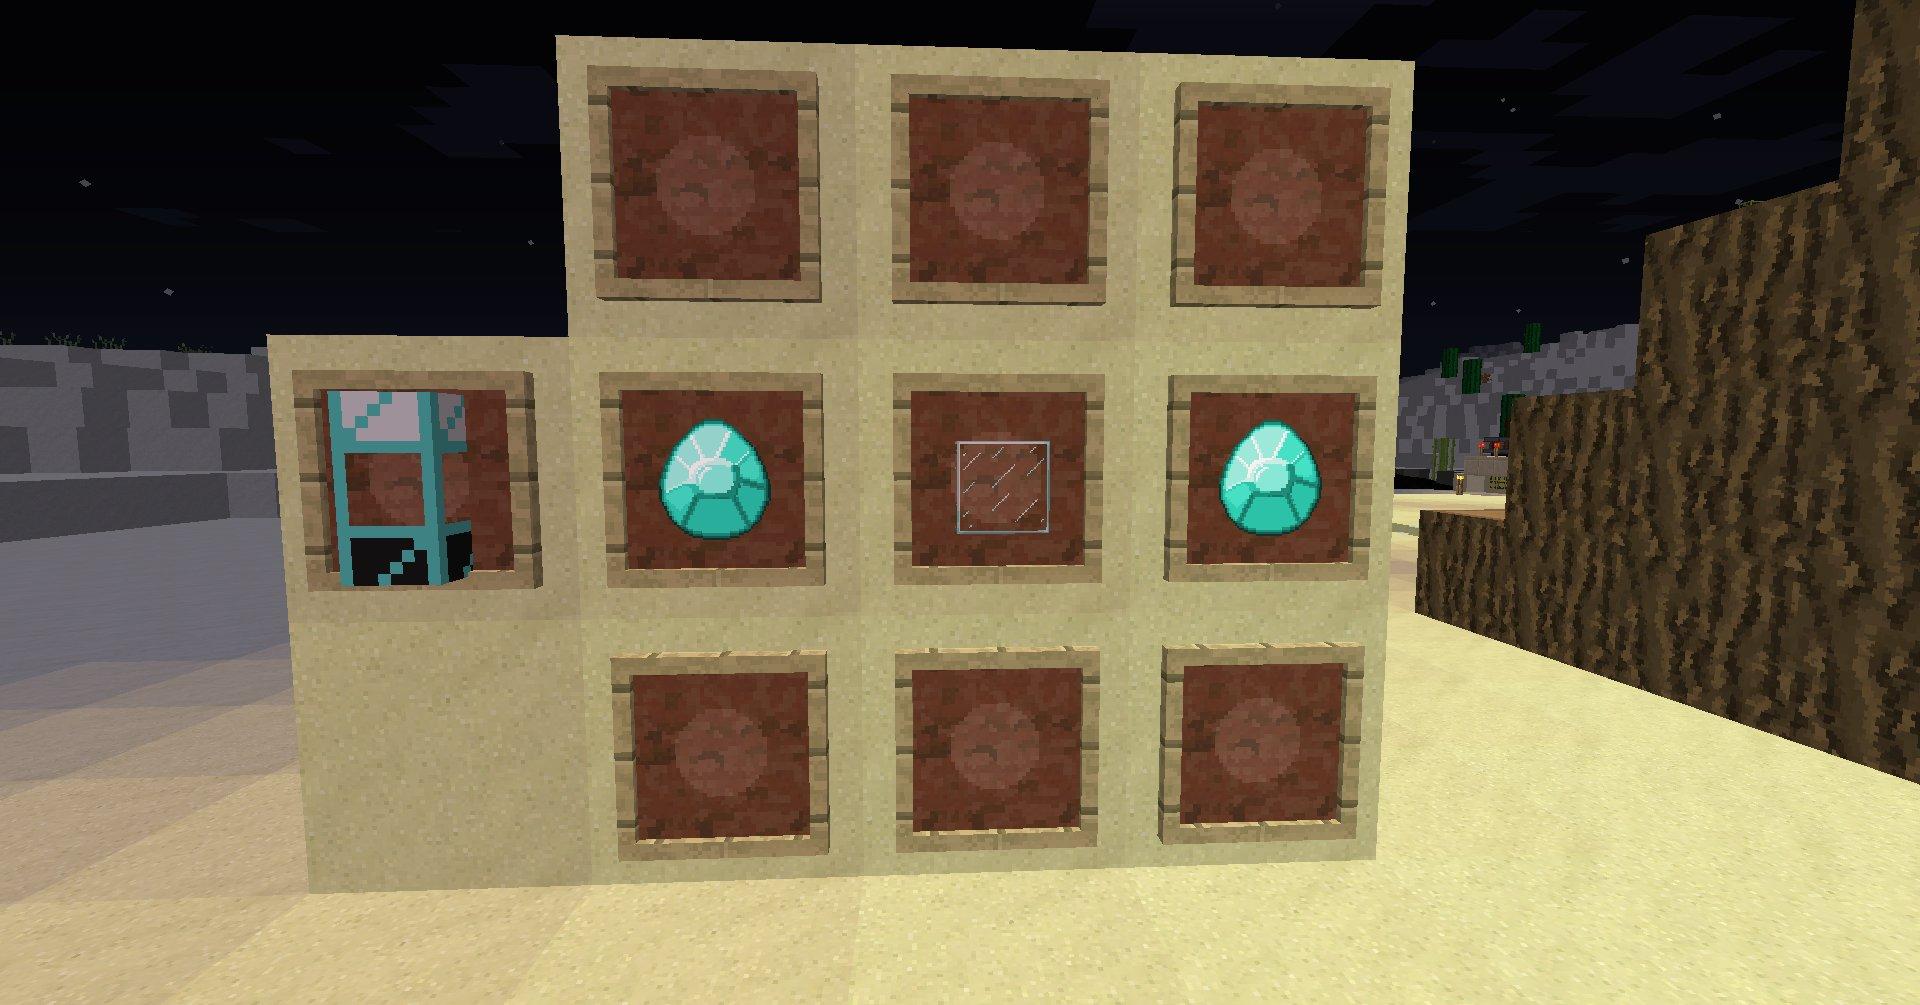 poradnik buildcraft 3 2